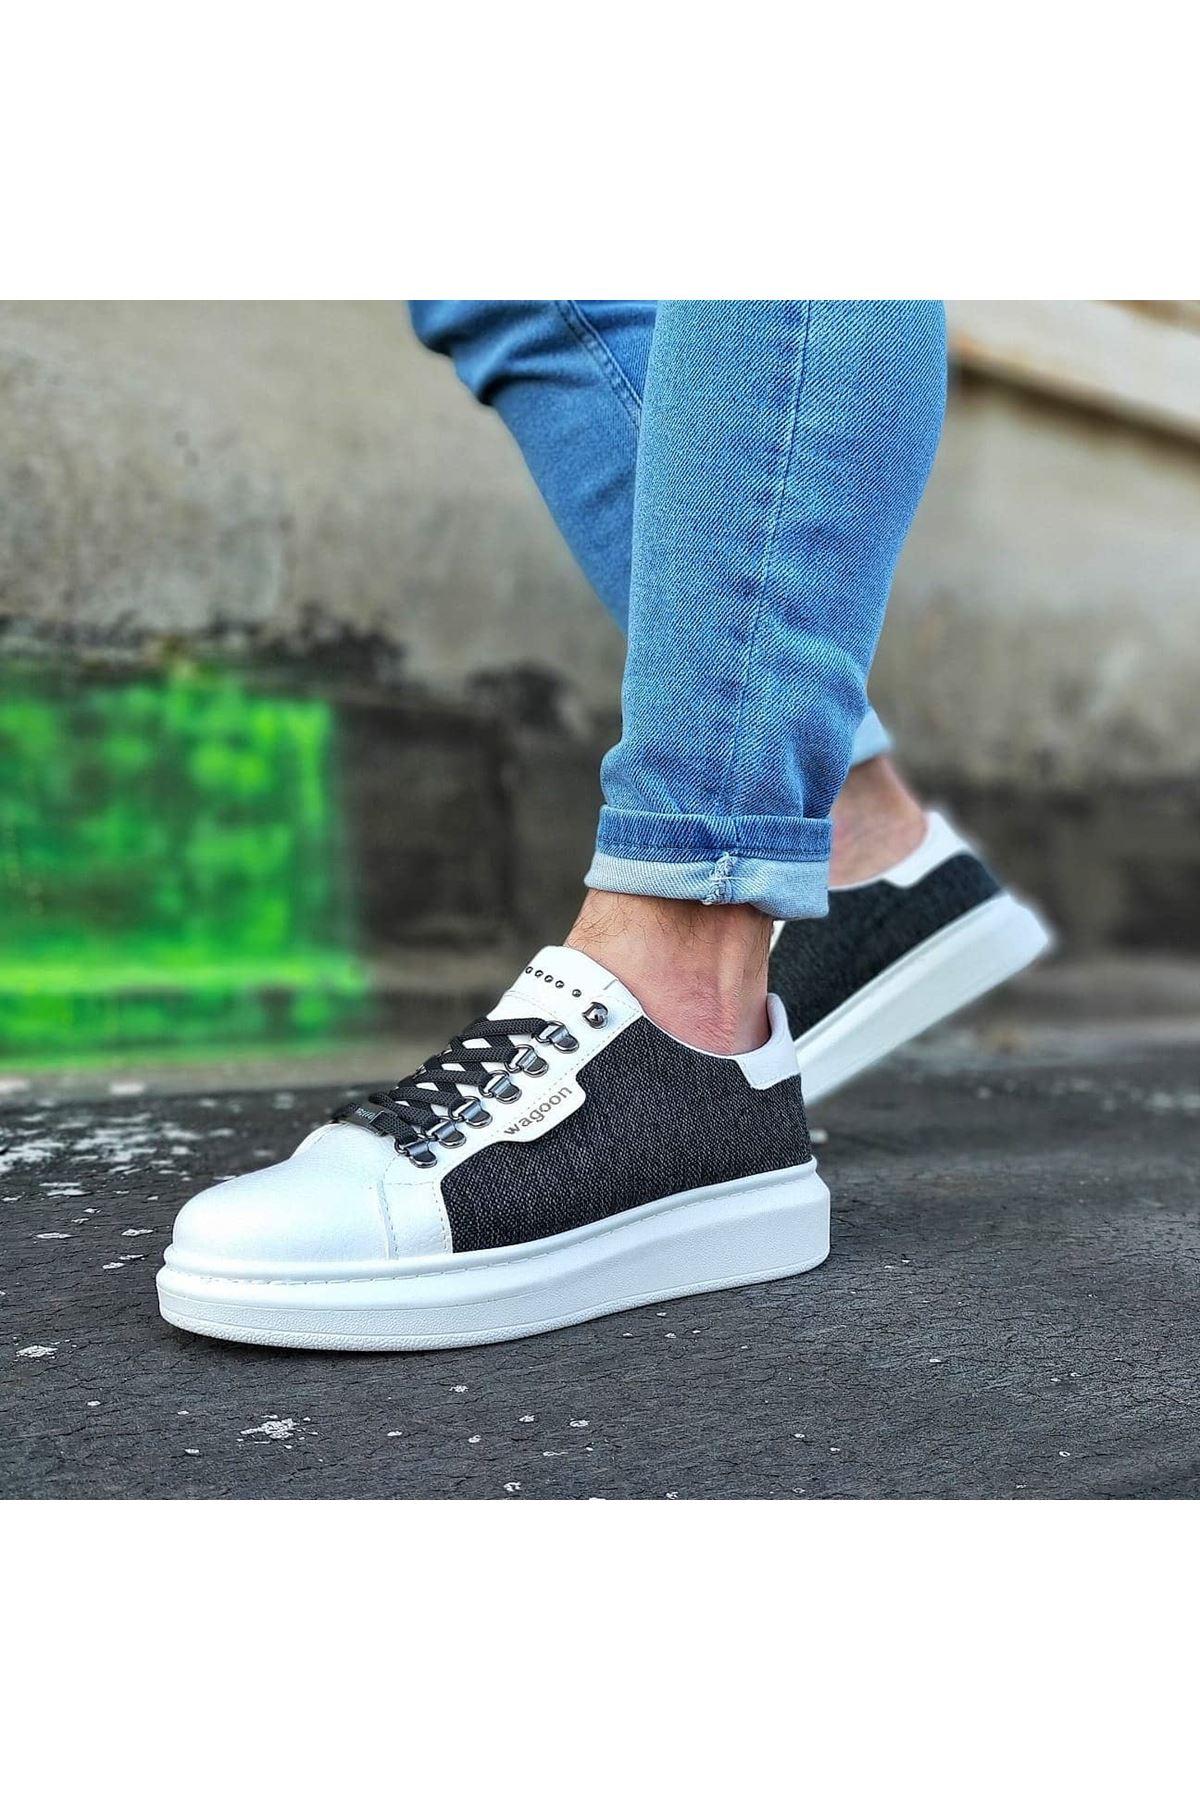 Wagoon WG01 Beyaz Siyah Keten Erkek Casual Ayakkabı